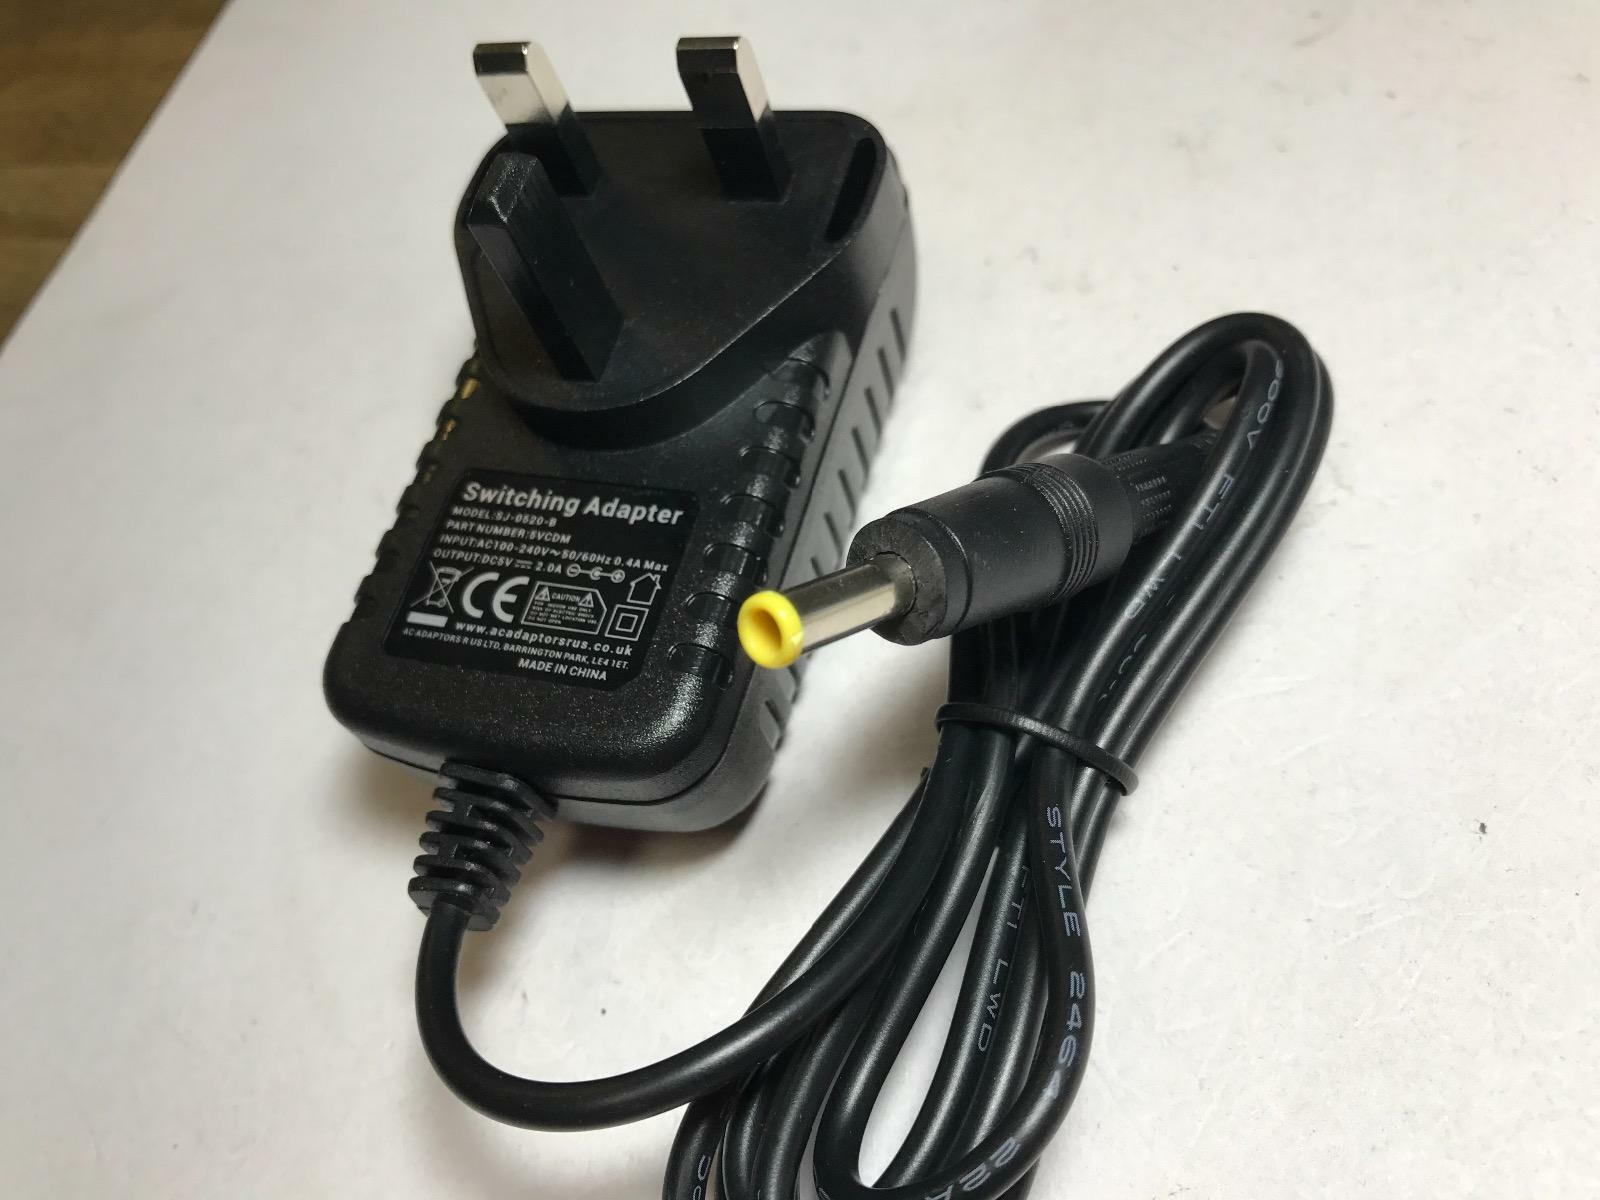 5V 0.5A 500mA AC-DC Switching Adaptor Power Supply 5x3.3 5.0mmx3.3mm